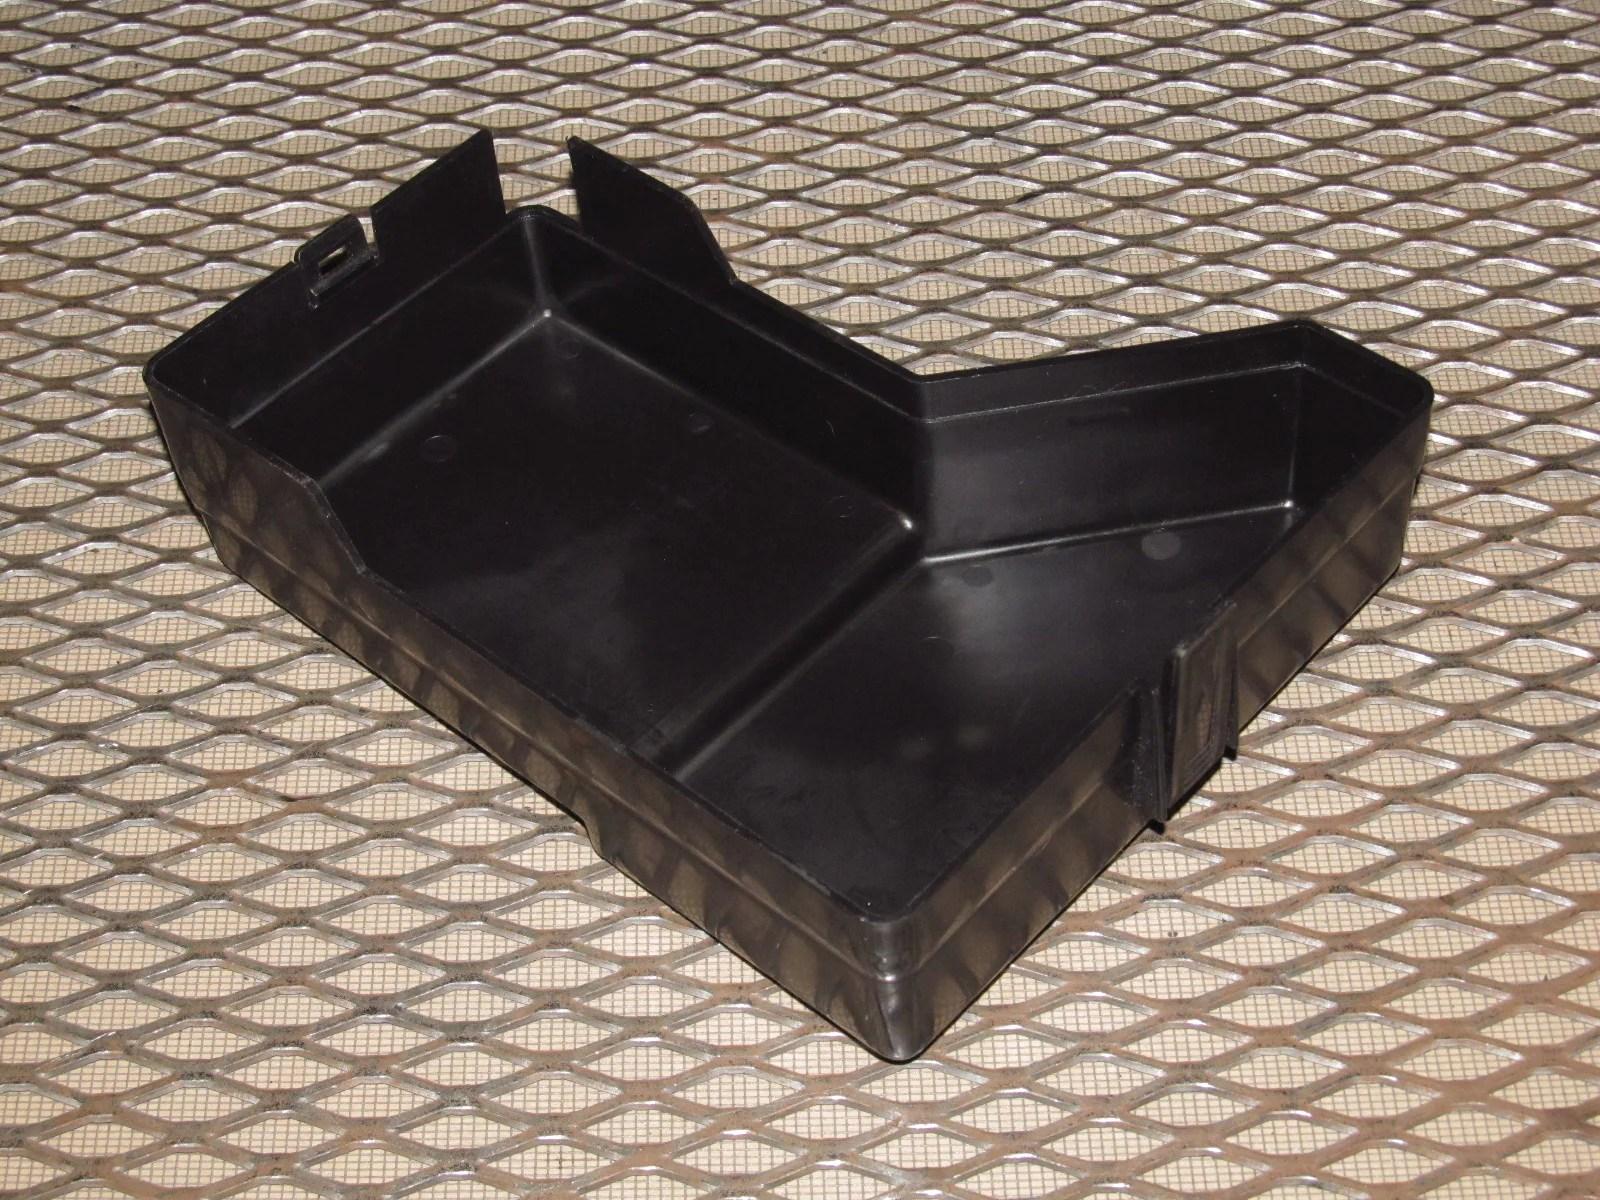 94 95 96 97 mitsubishi 3000gt oem engine fuse box cover [ 1600 x 1200 Pixel ]